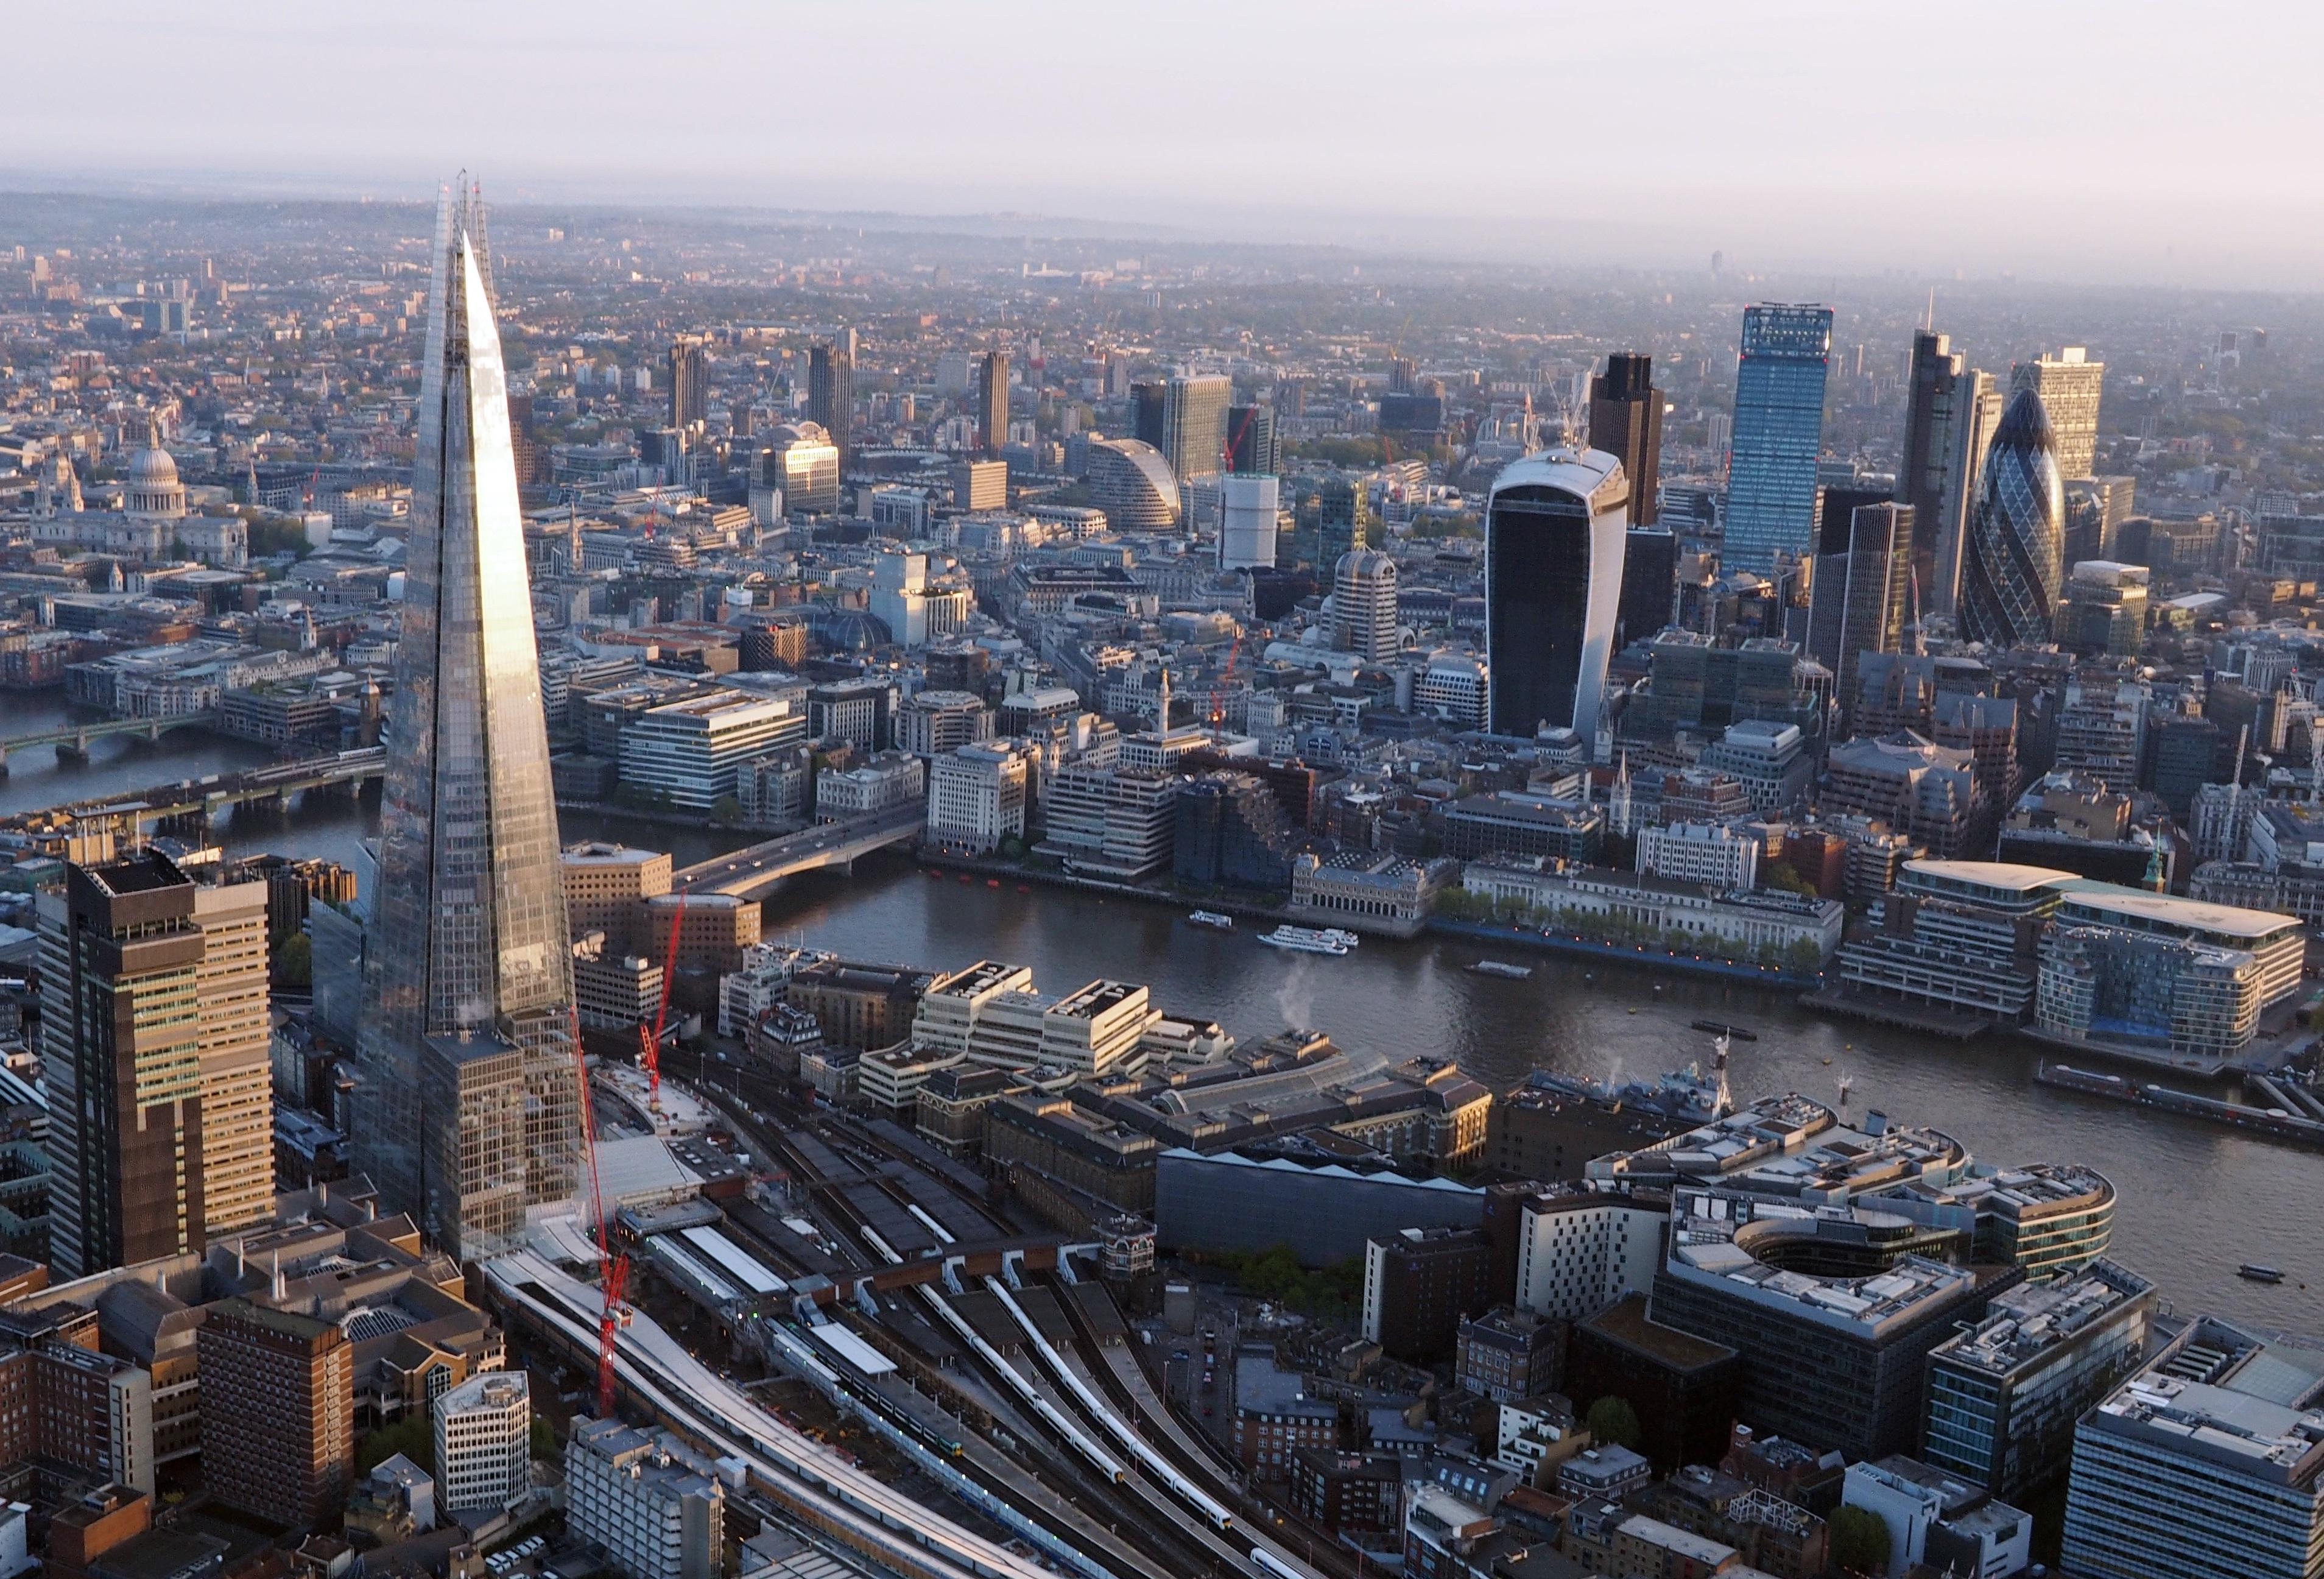 London from a hot air balloon.